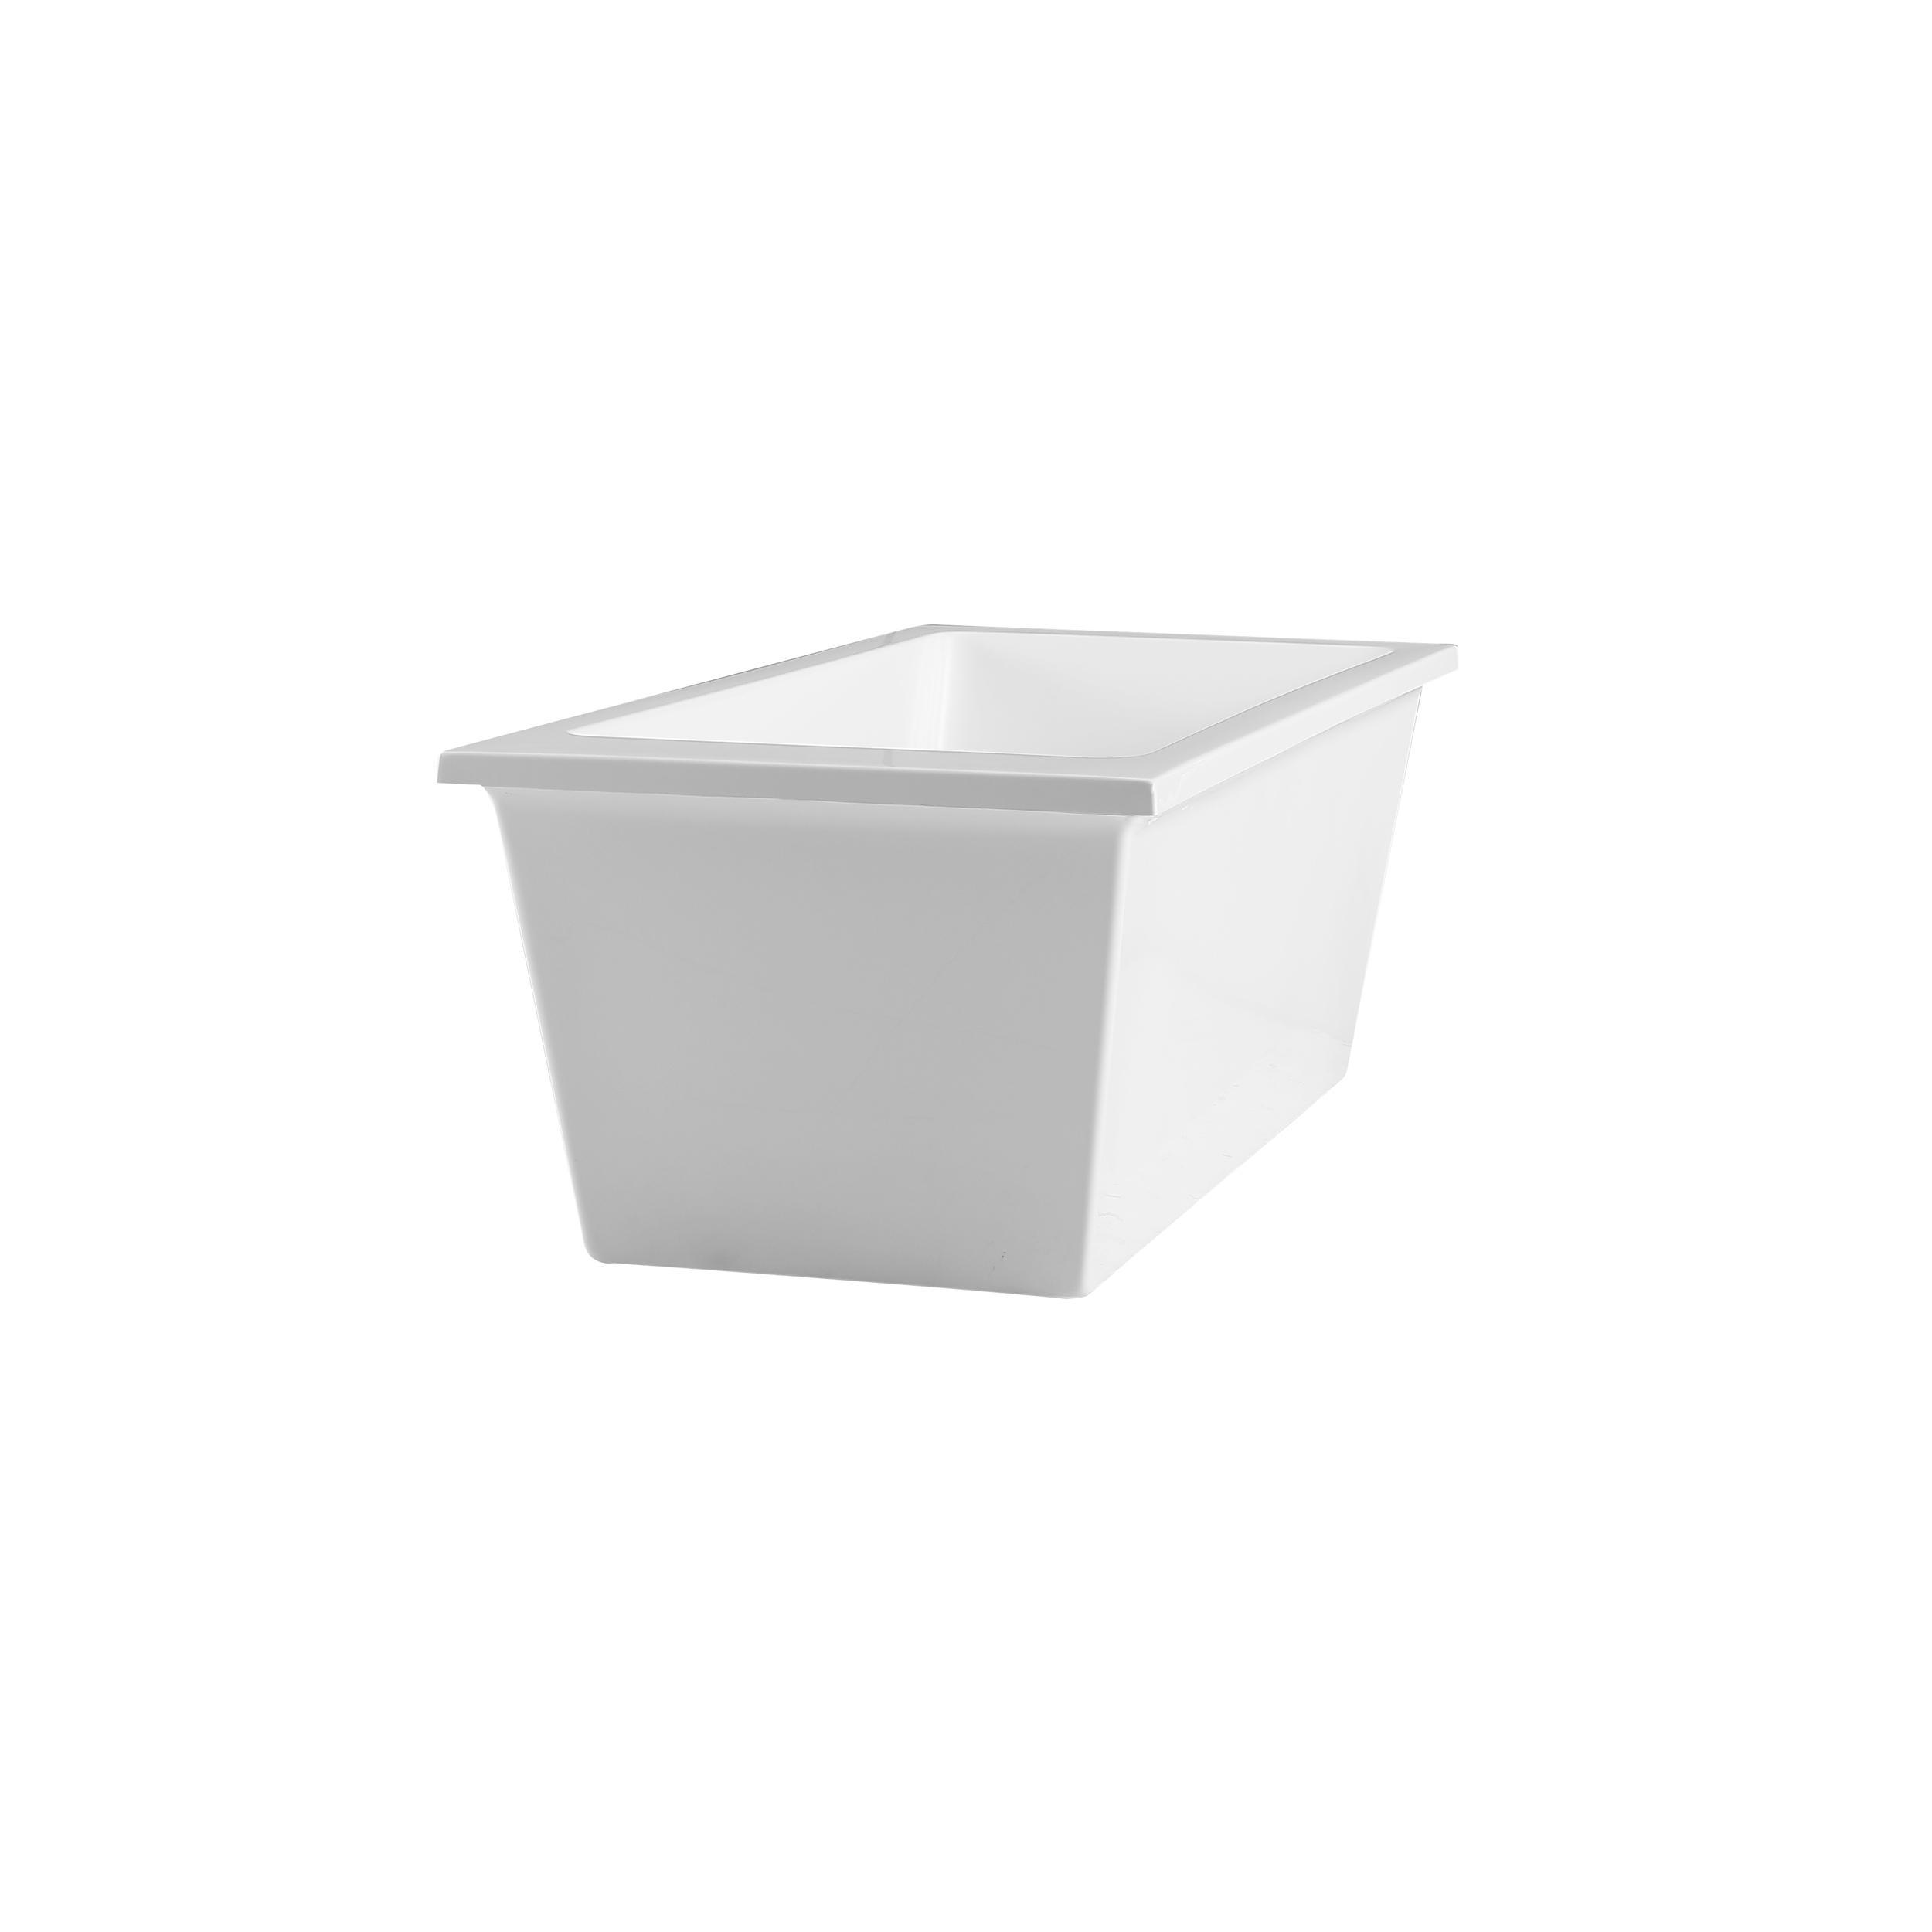 Ove Decors Houston Freestanding Bathtub 69 Inch By 31